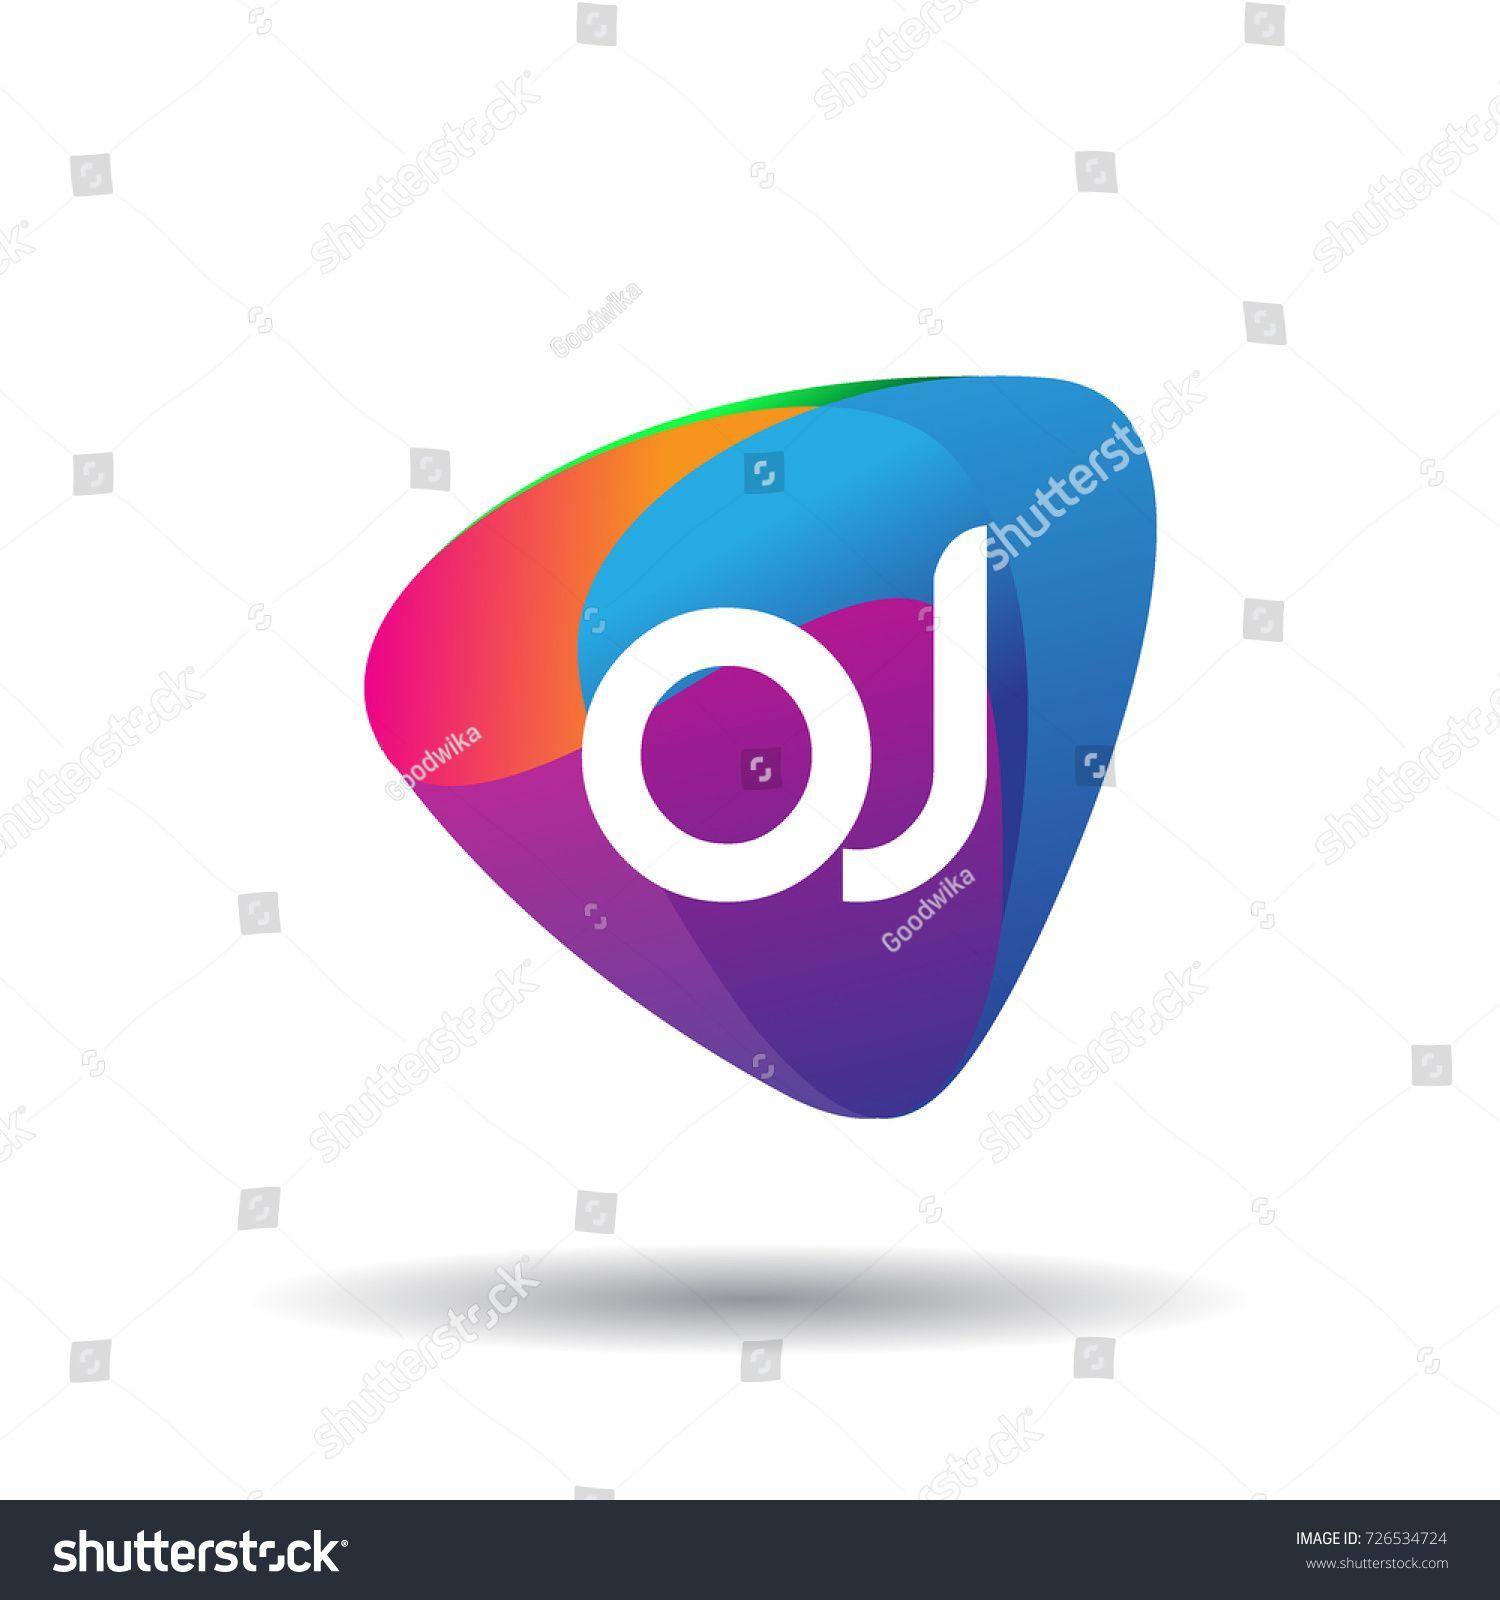 Letter Oj Logo With Colorful Splash Background Letter Combination